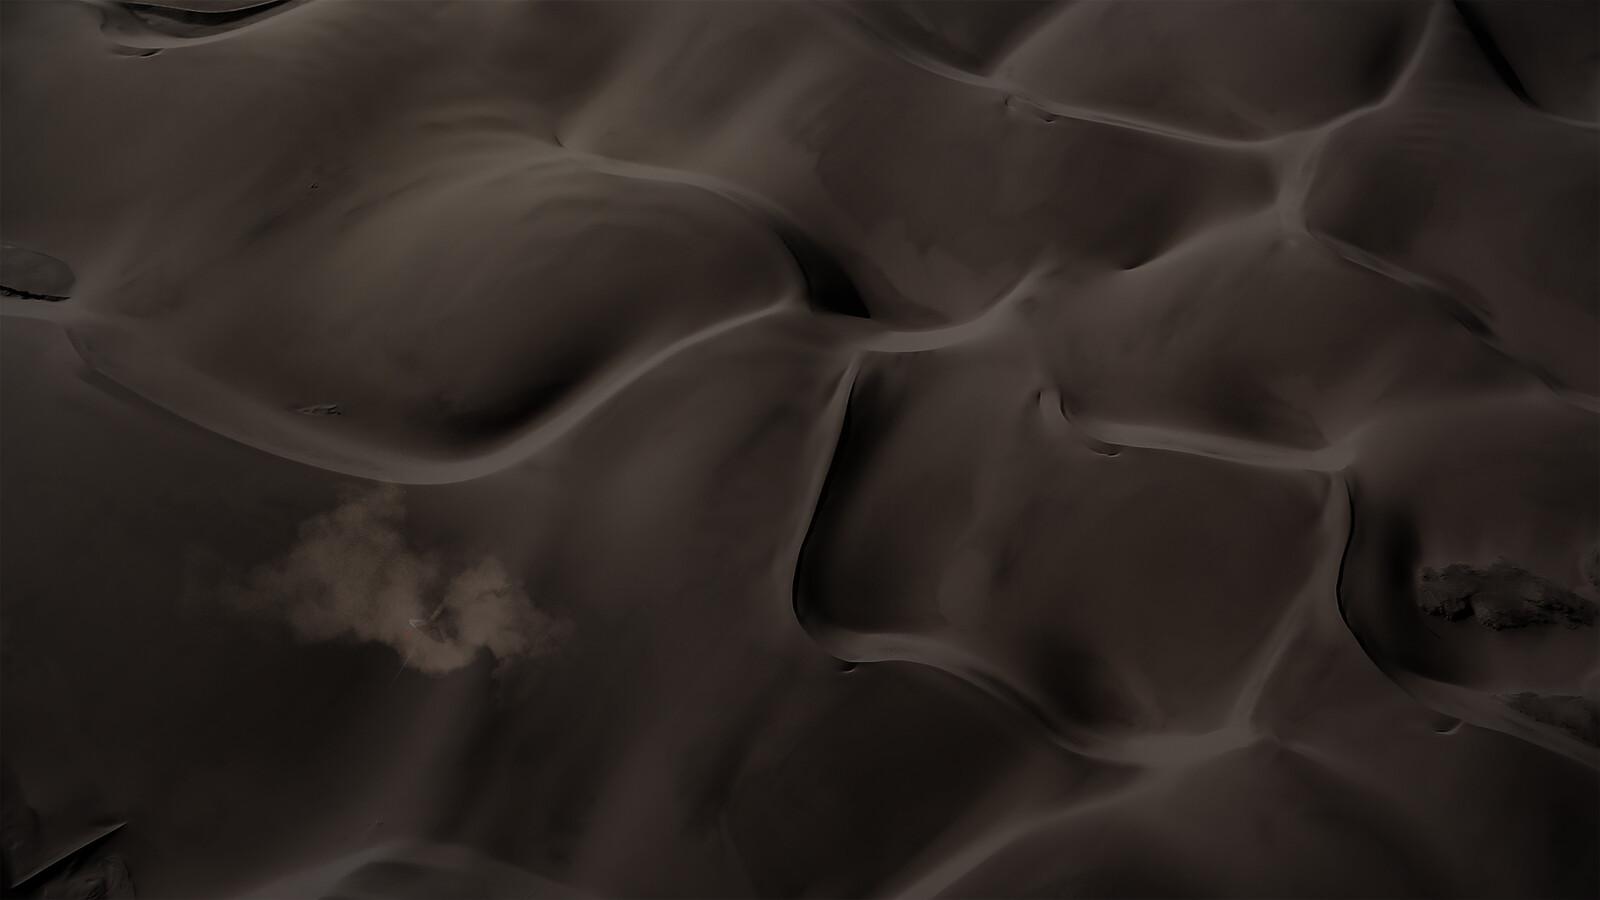 Desert concept image Aerial